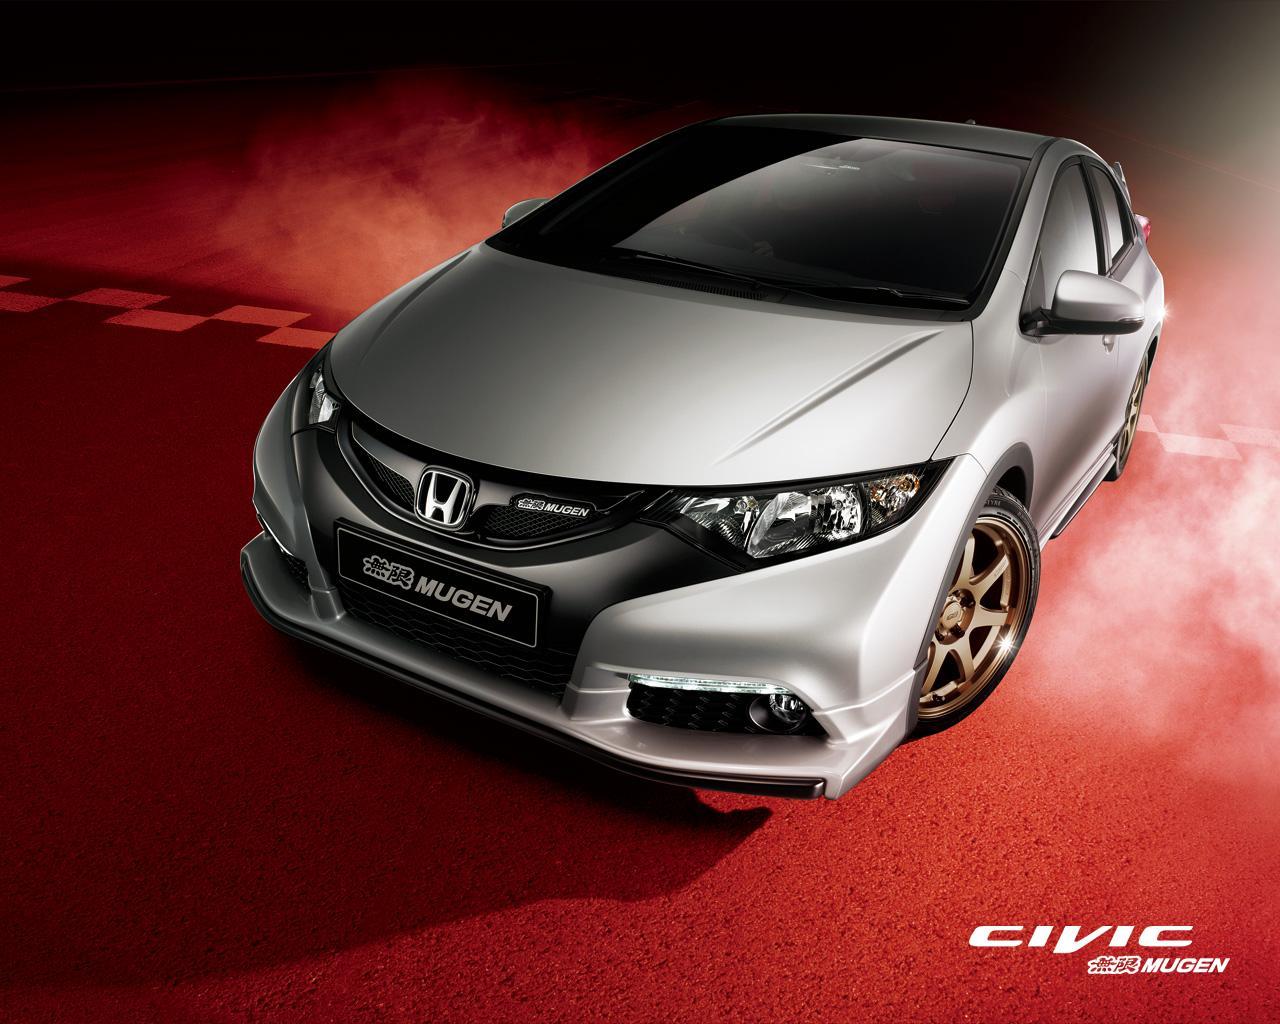 2016 Honda Accord For Sale >> Honda Civic Hatchback Gets Mugen Styling Pack - autoevolution